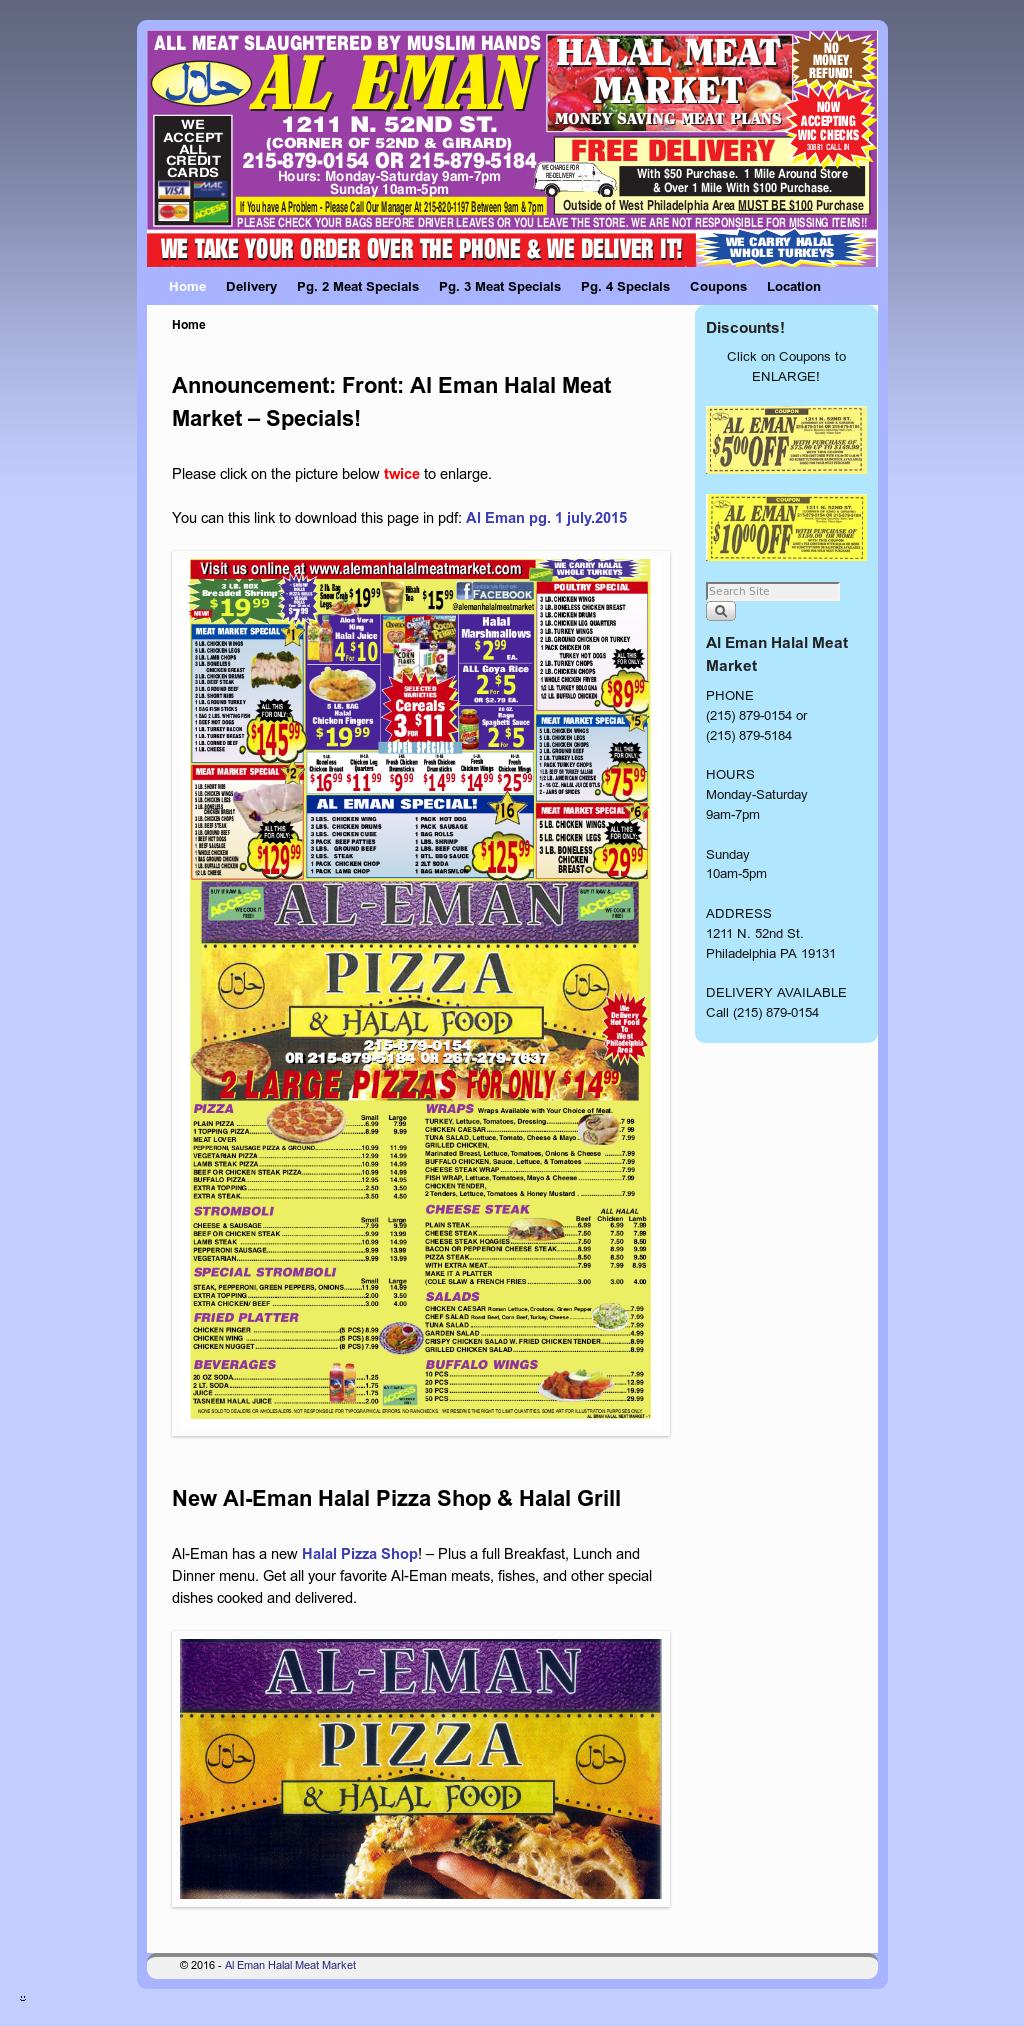 Al Eman Halal Meat Market Competitors, Revenue and Employees - Owler